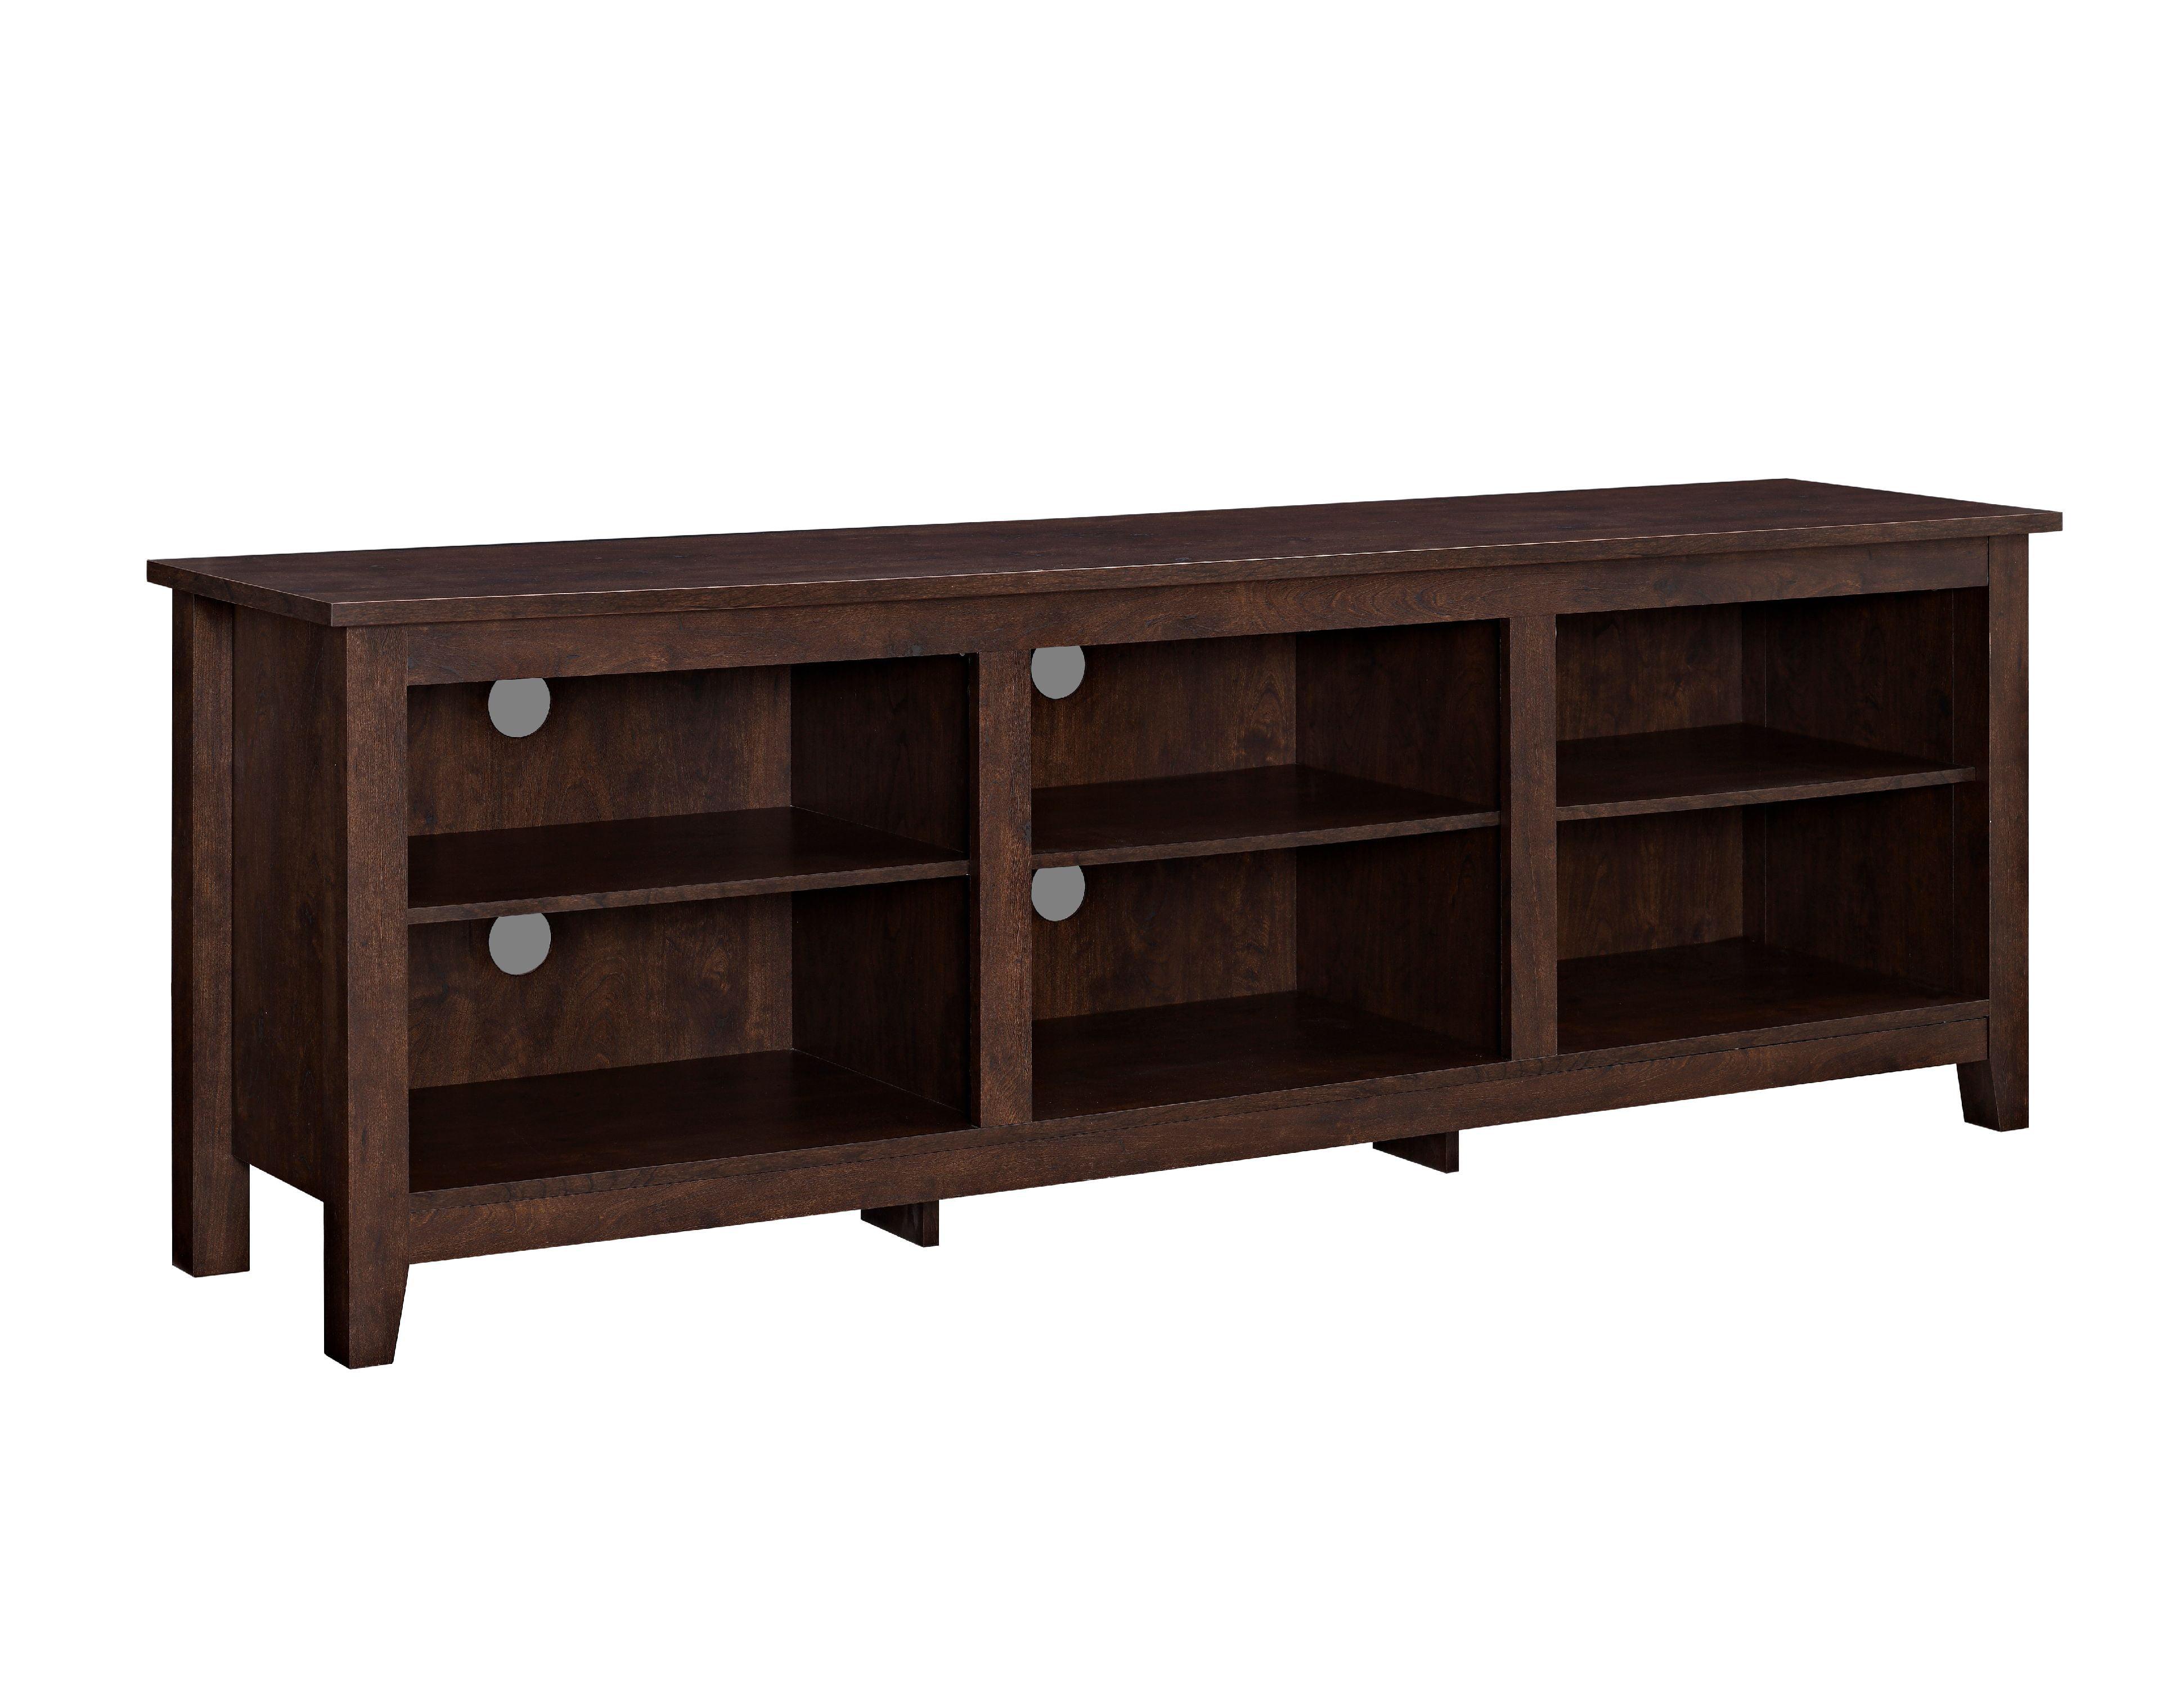 Dark Wood Tv Credenza : Walker edison wood tv media storage stand for s up to